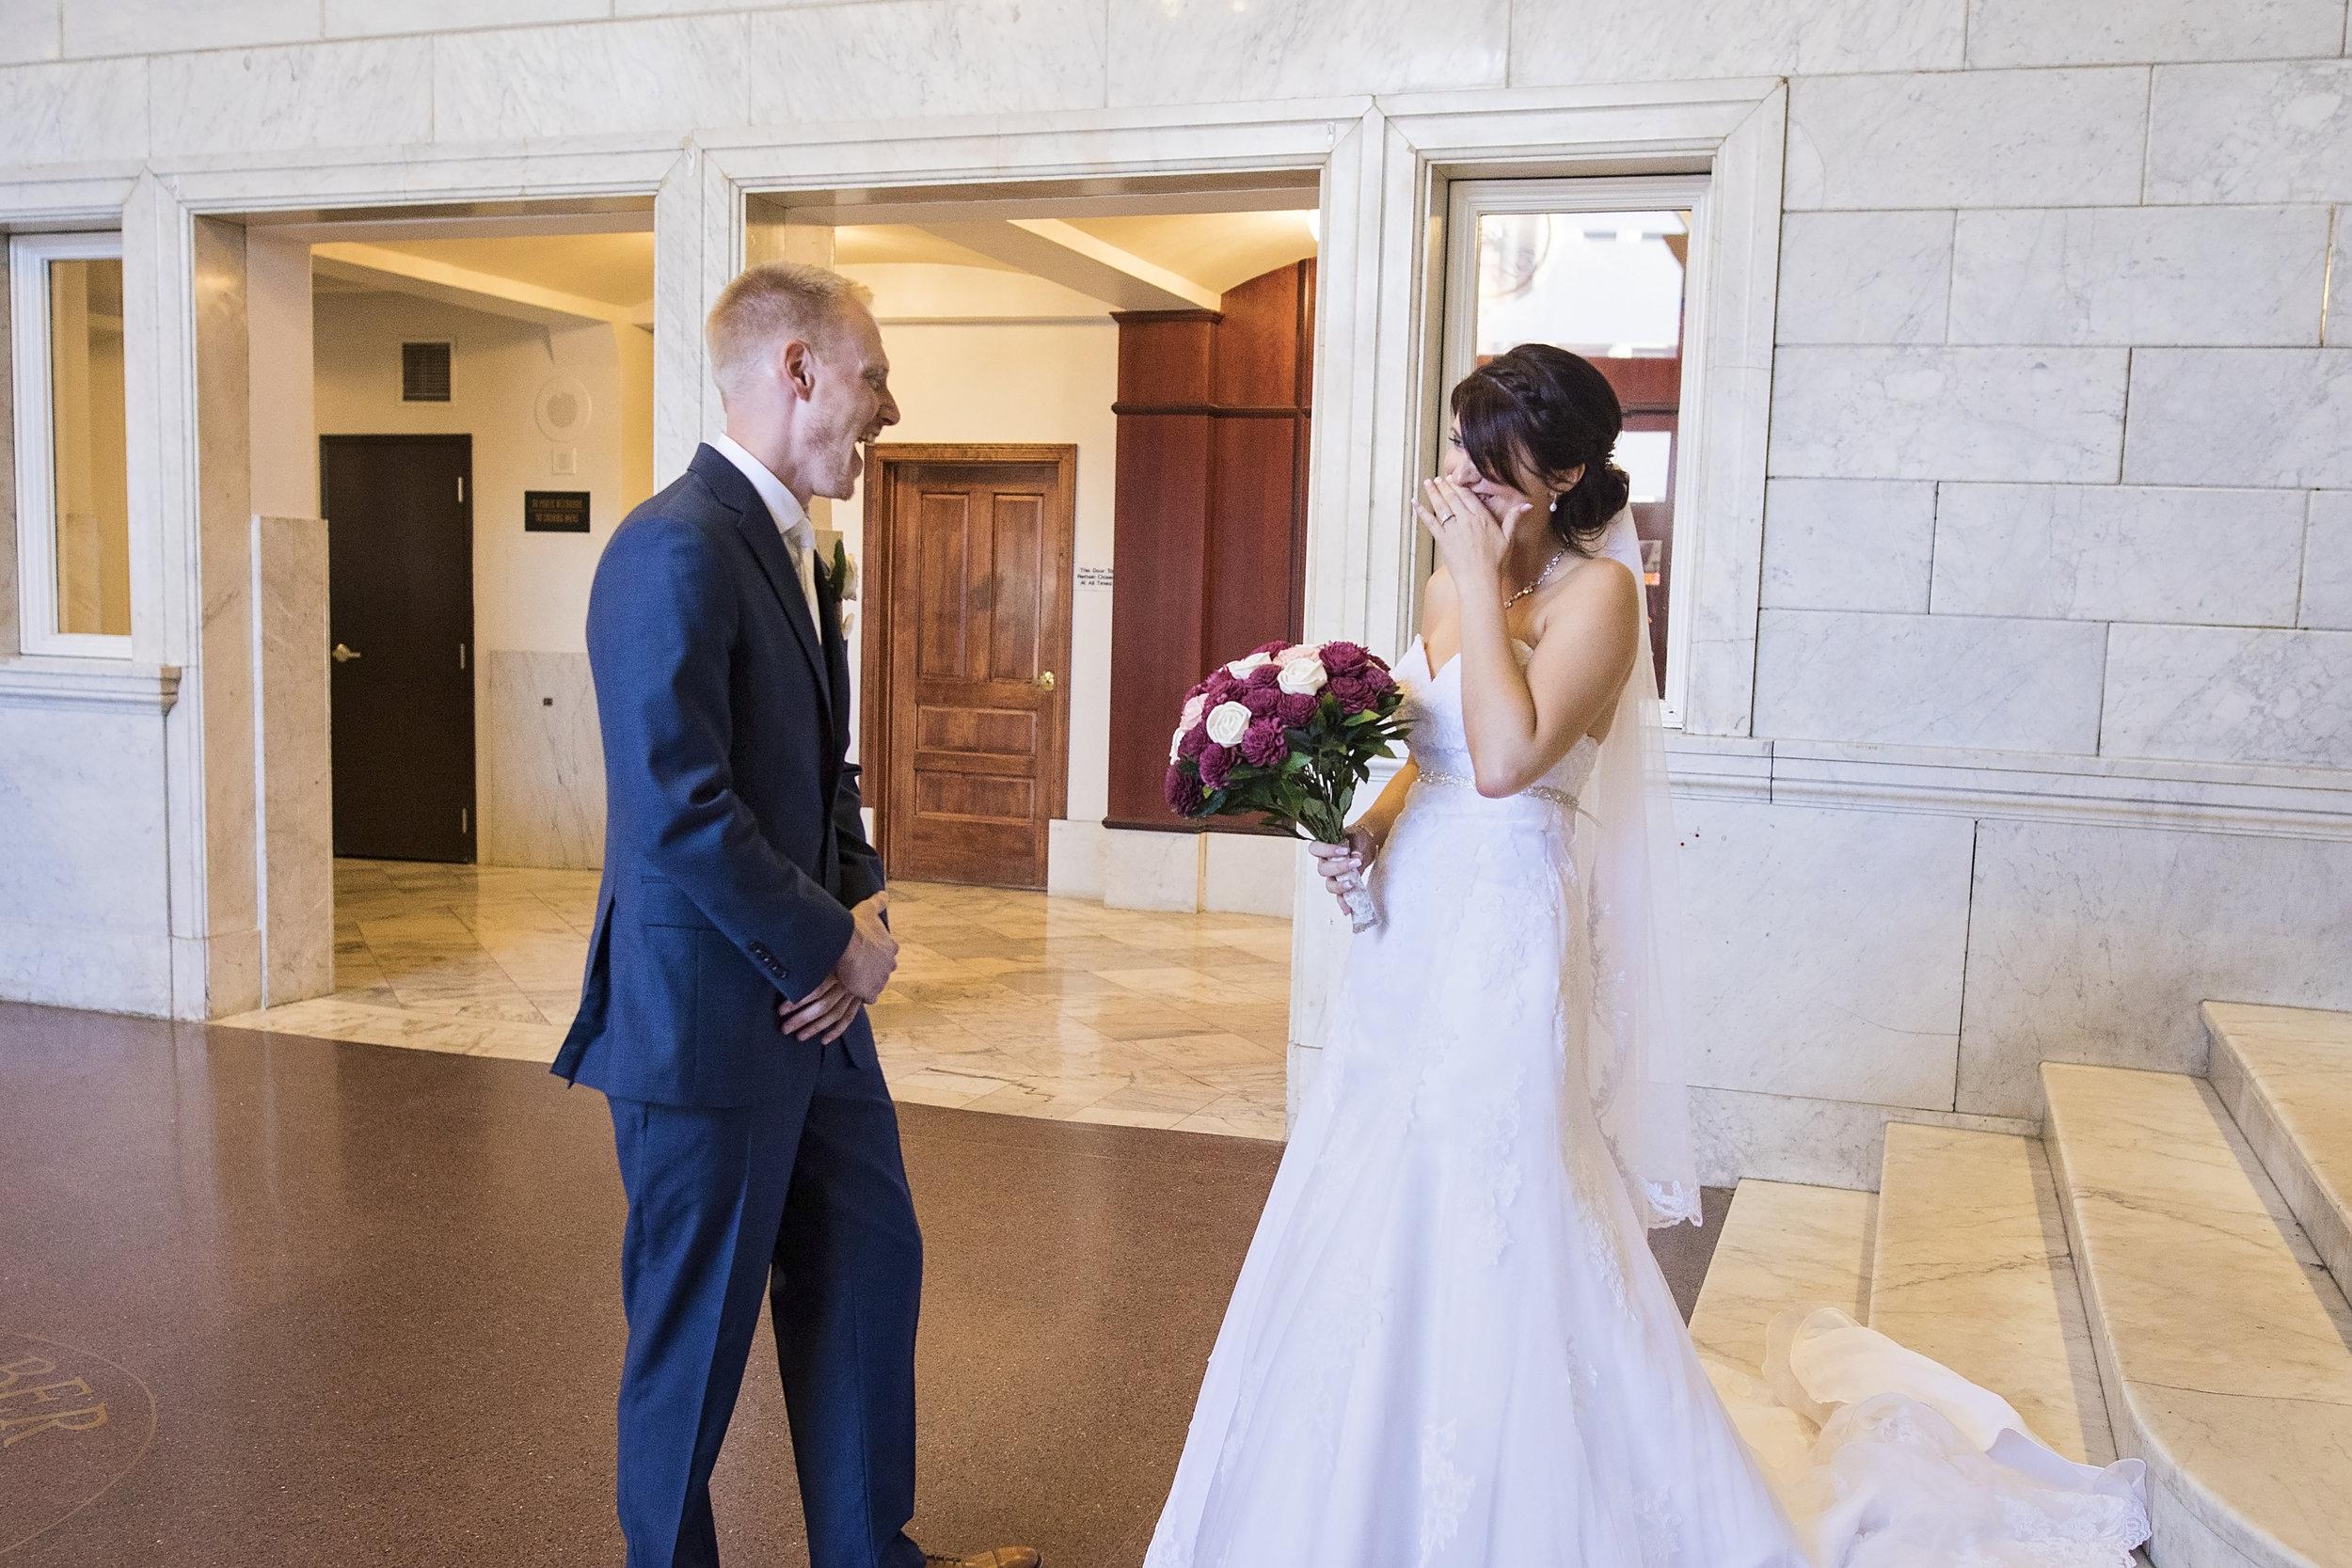 CourtneyIan_Wedding_Preview_0012.jpg